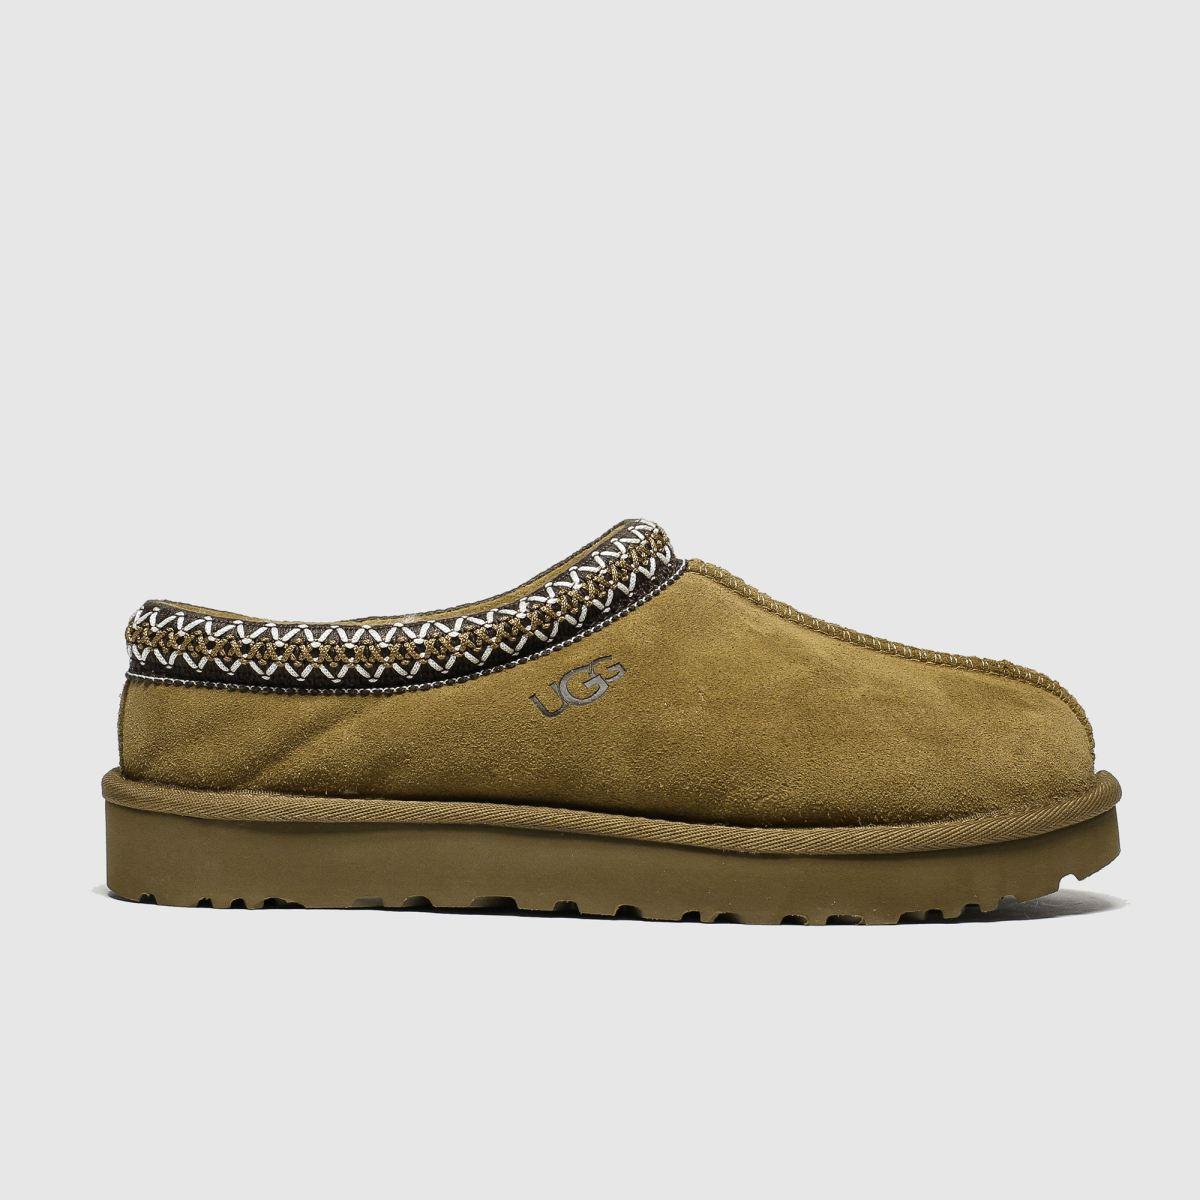 Ugg Tan Tasman Slippers